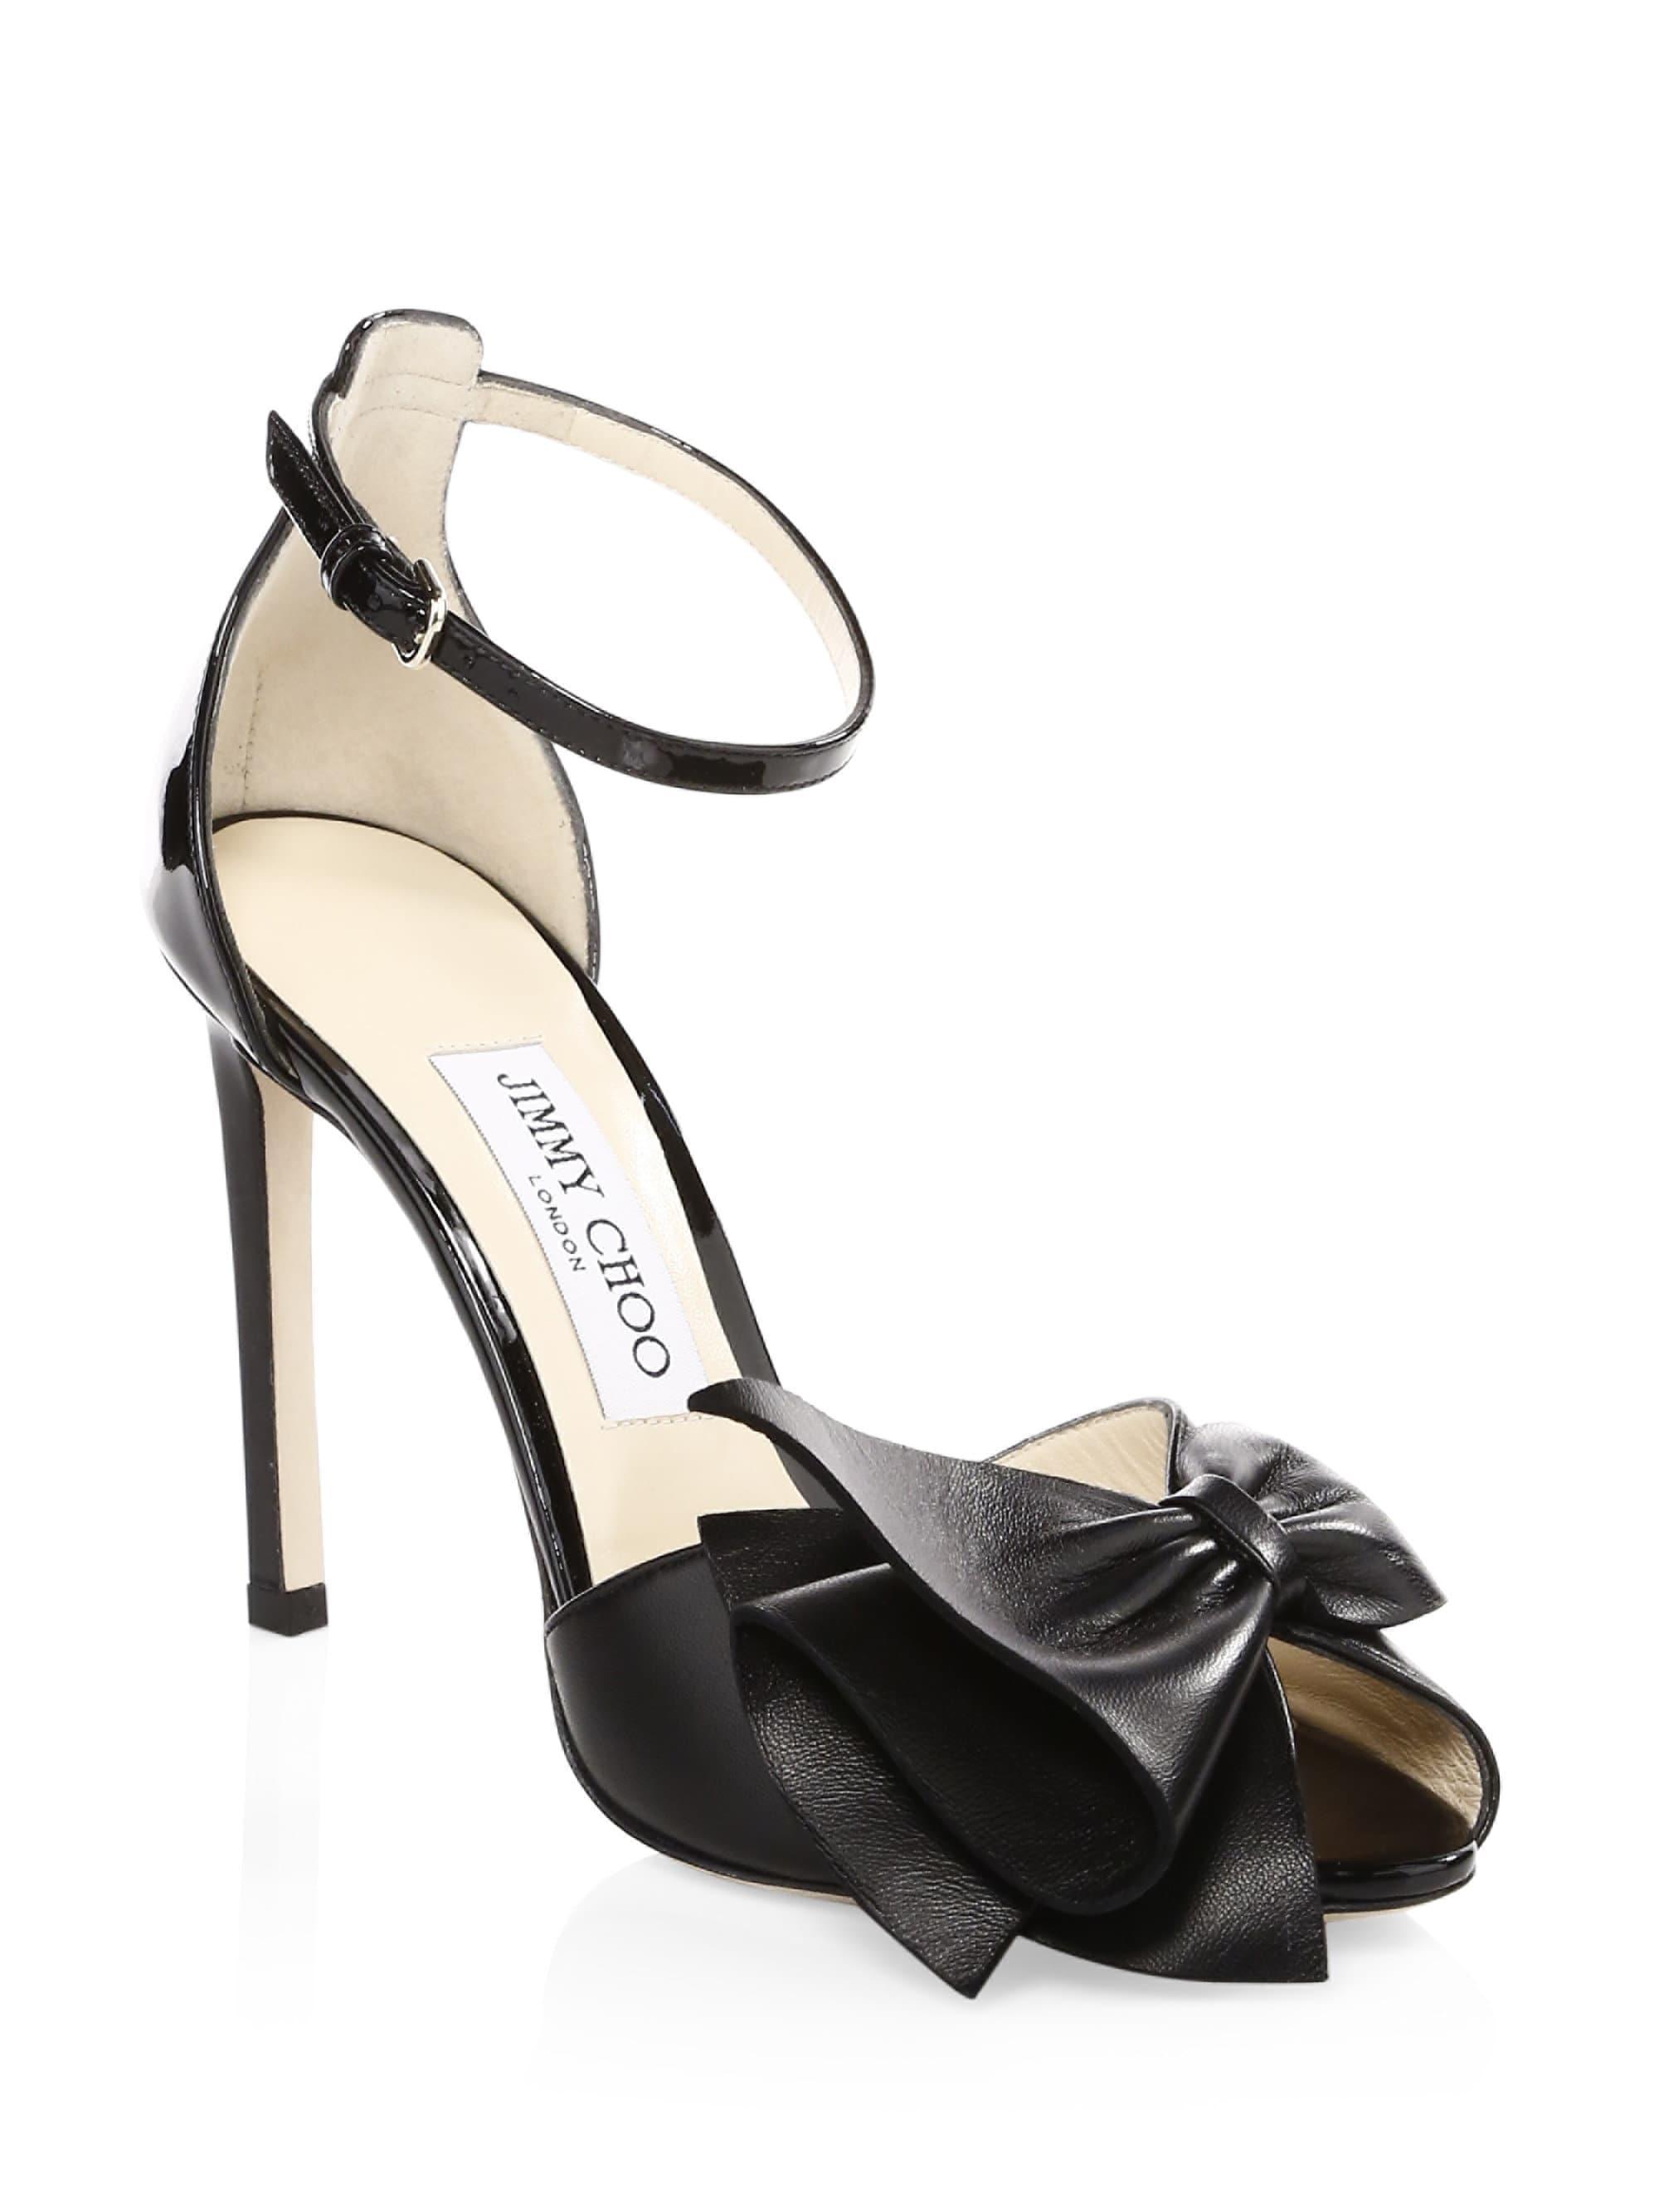 f6c471bb01 Jimmy Choo Women's Karlotta Peep Toe Heels - Black in Black - Lyst